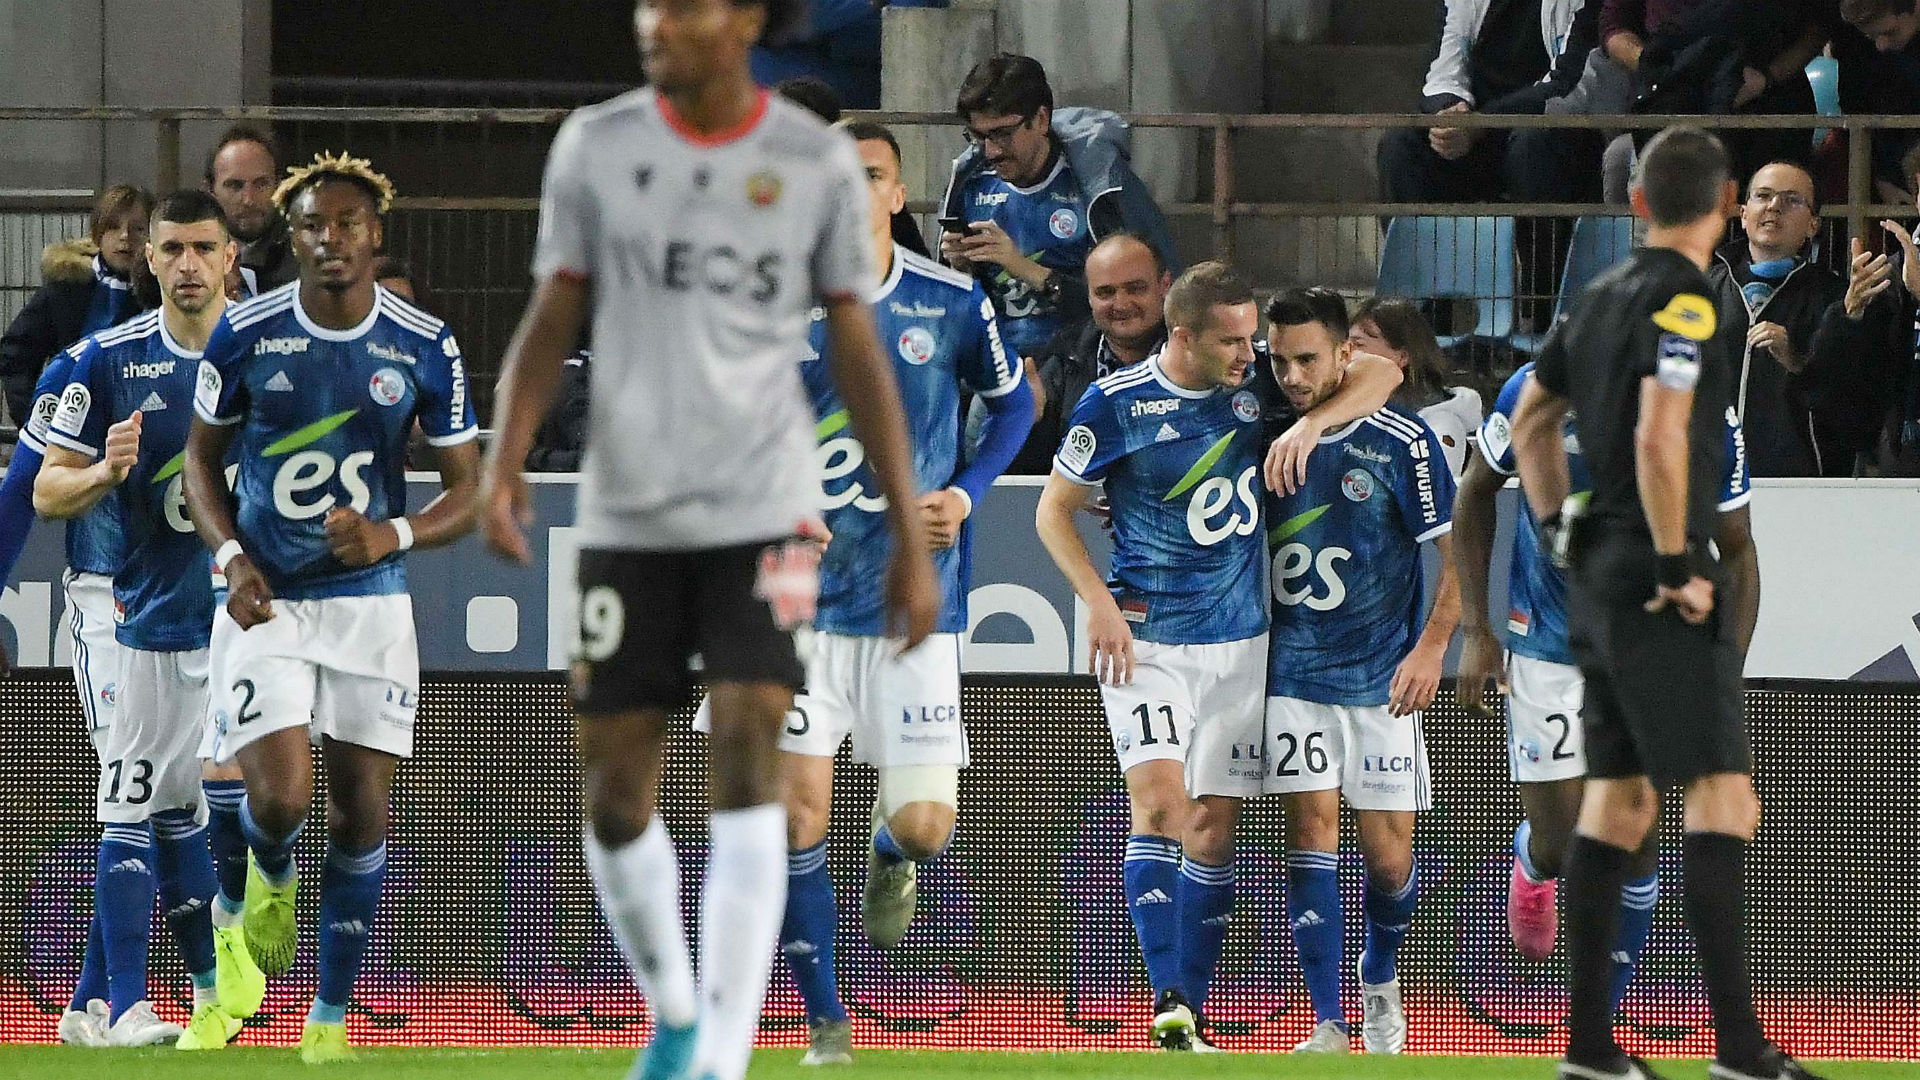 5 joueurs positifs au Covid-19 — Strasbourg